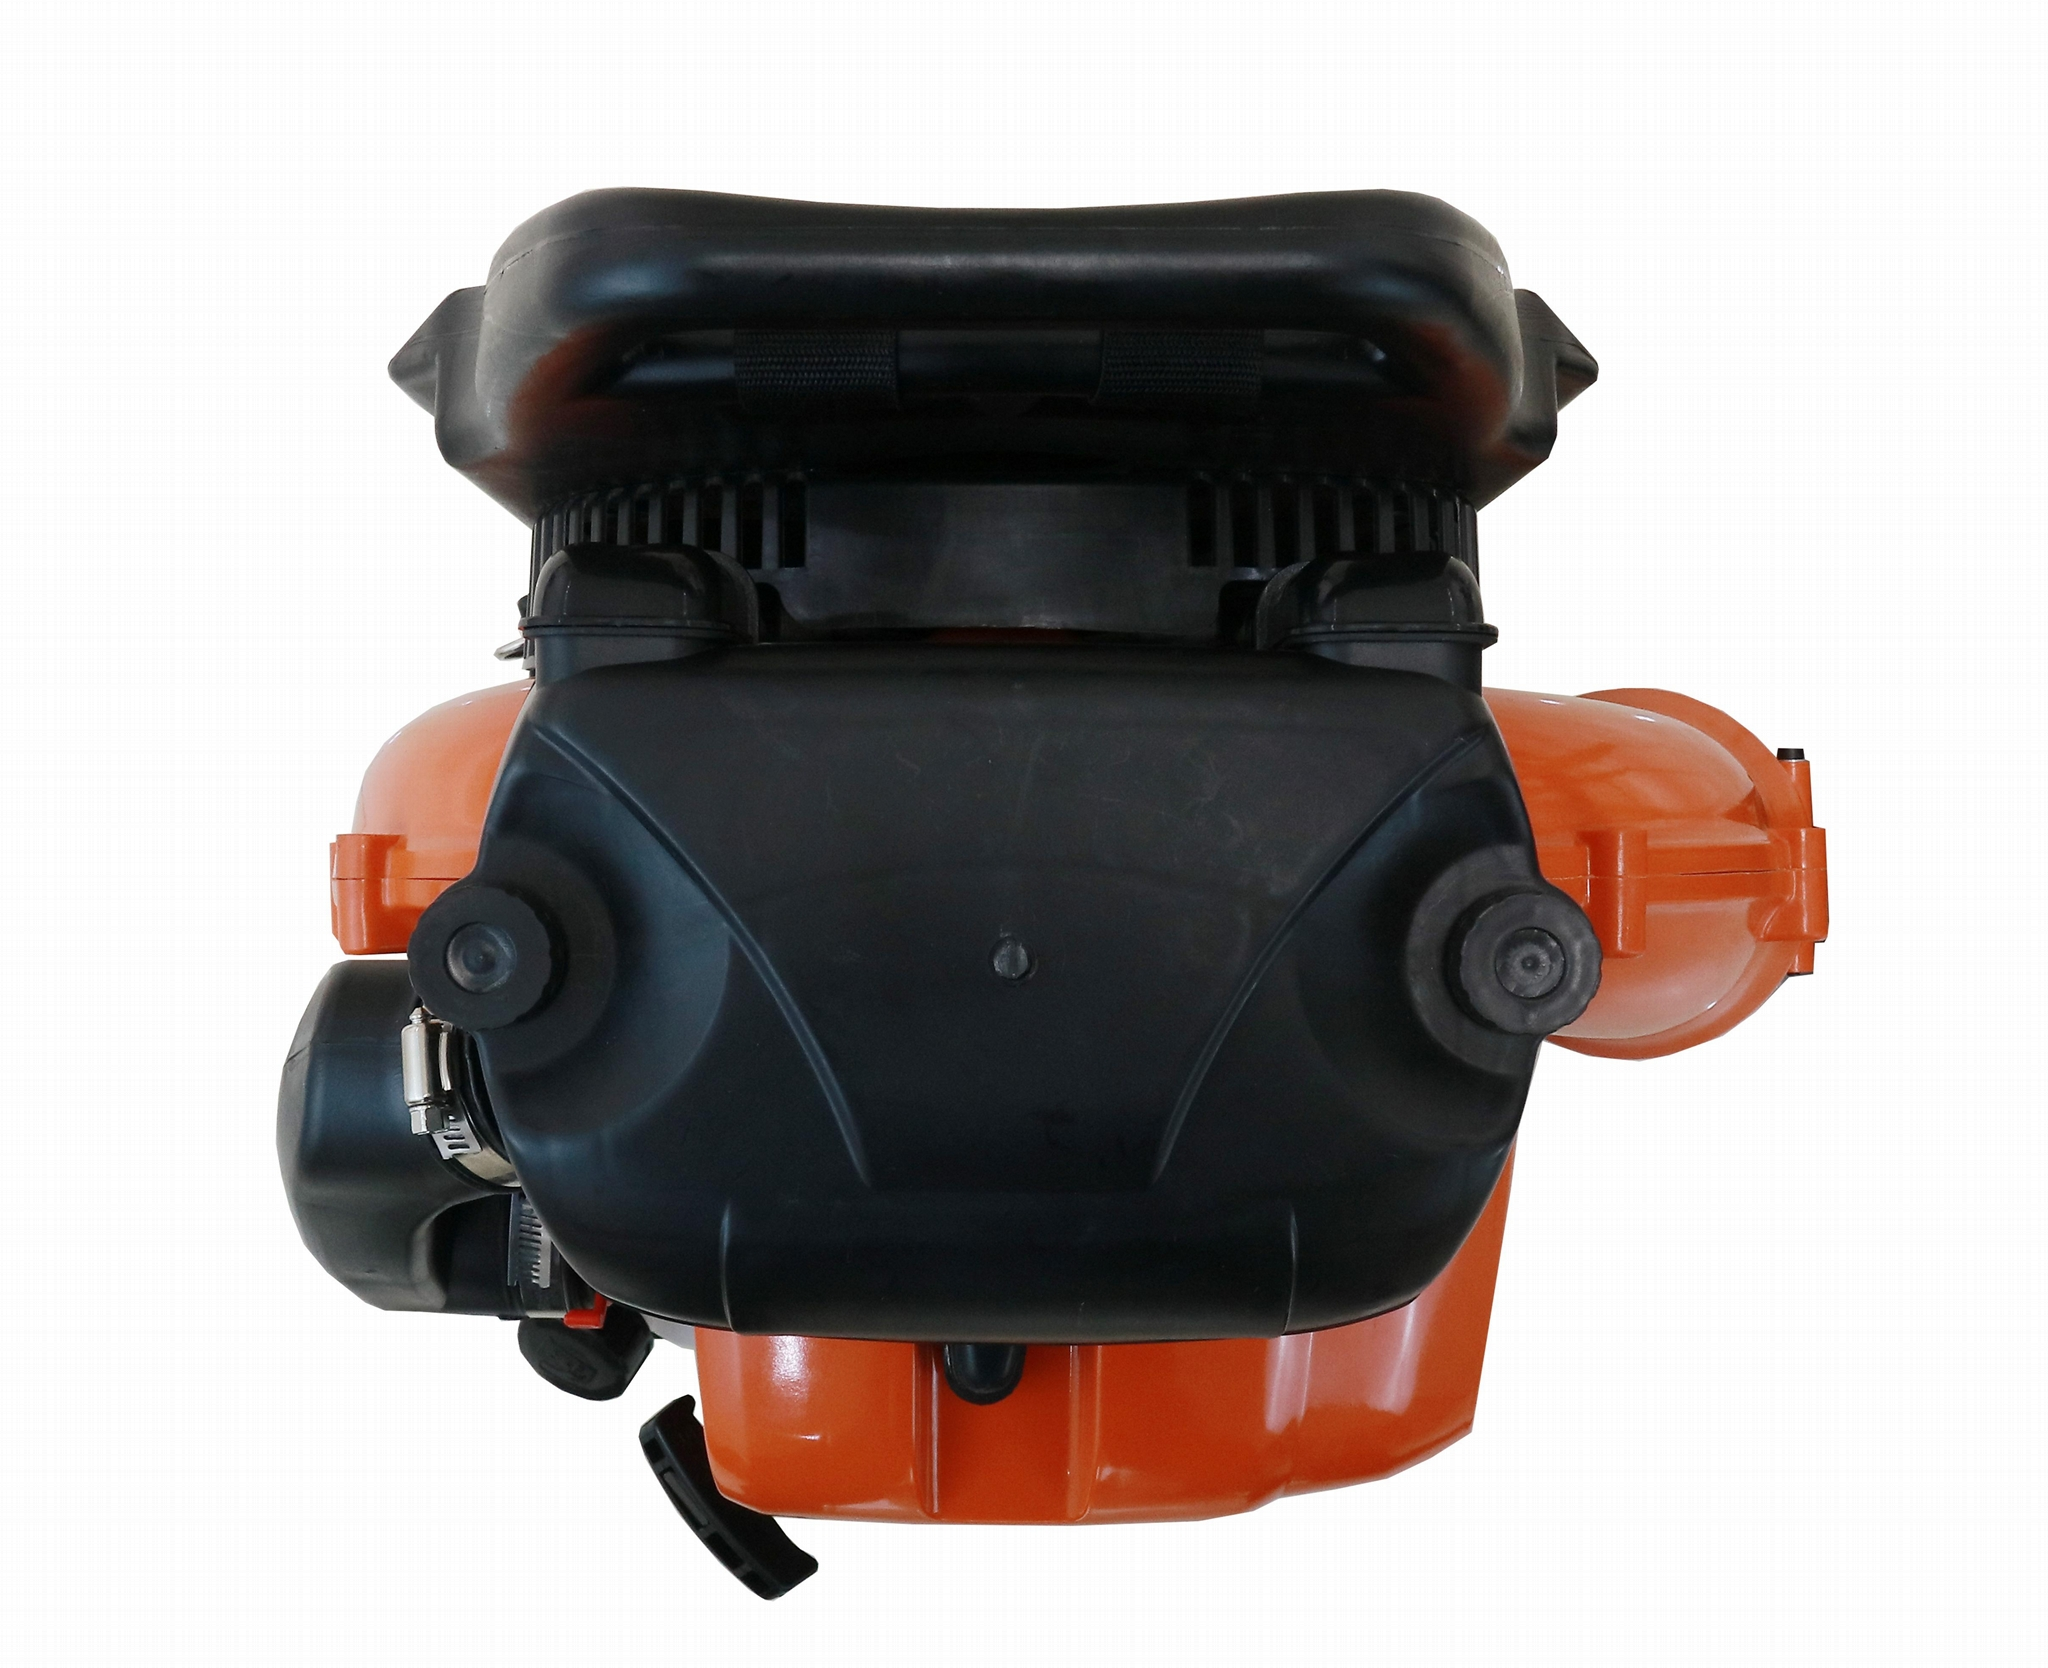 Garden Husqvarna two-stroke backpack engine  Snow blower wind Extinguisher  4